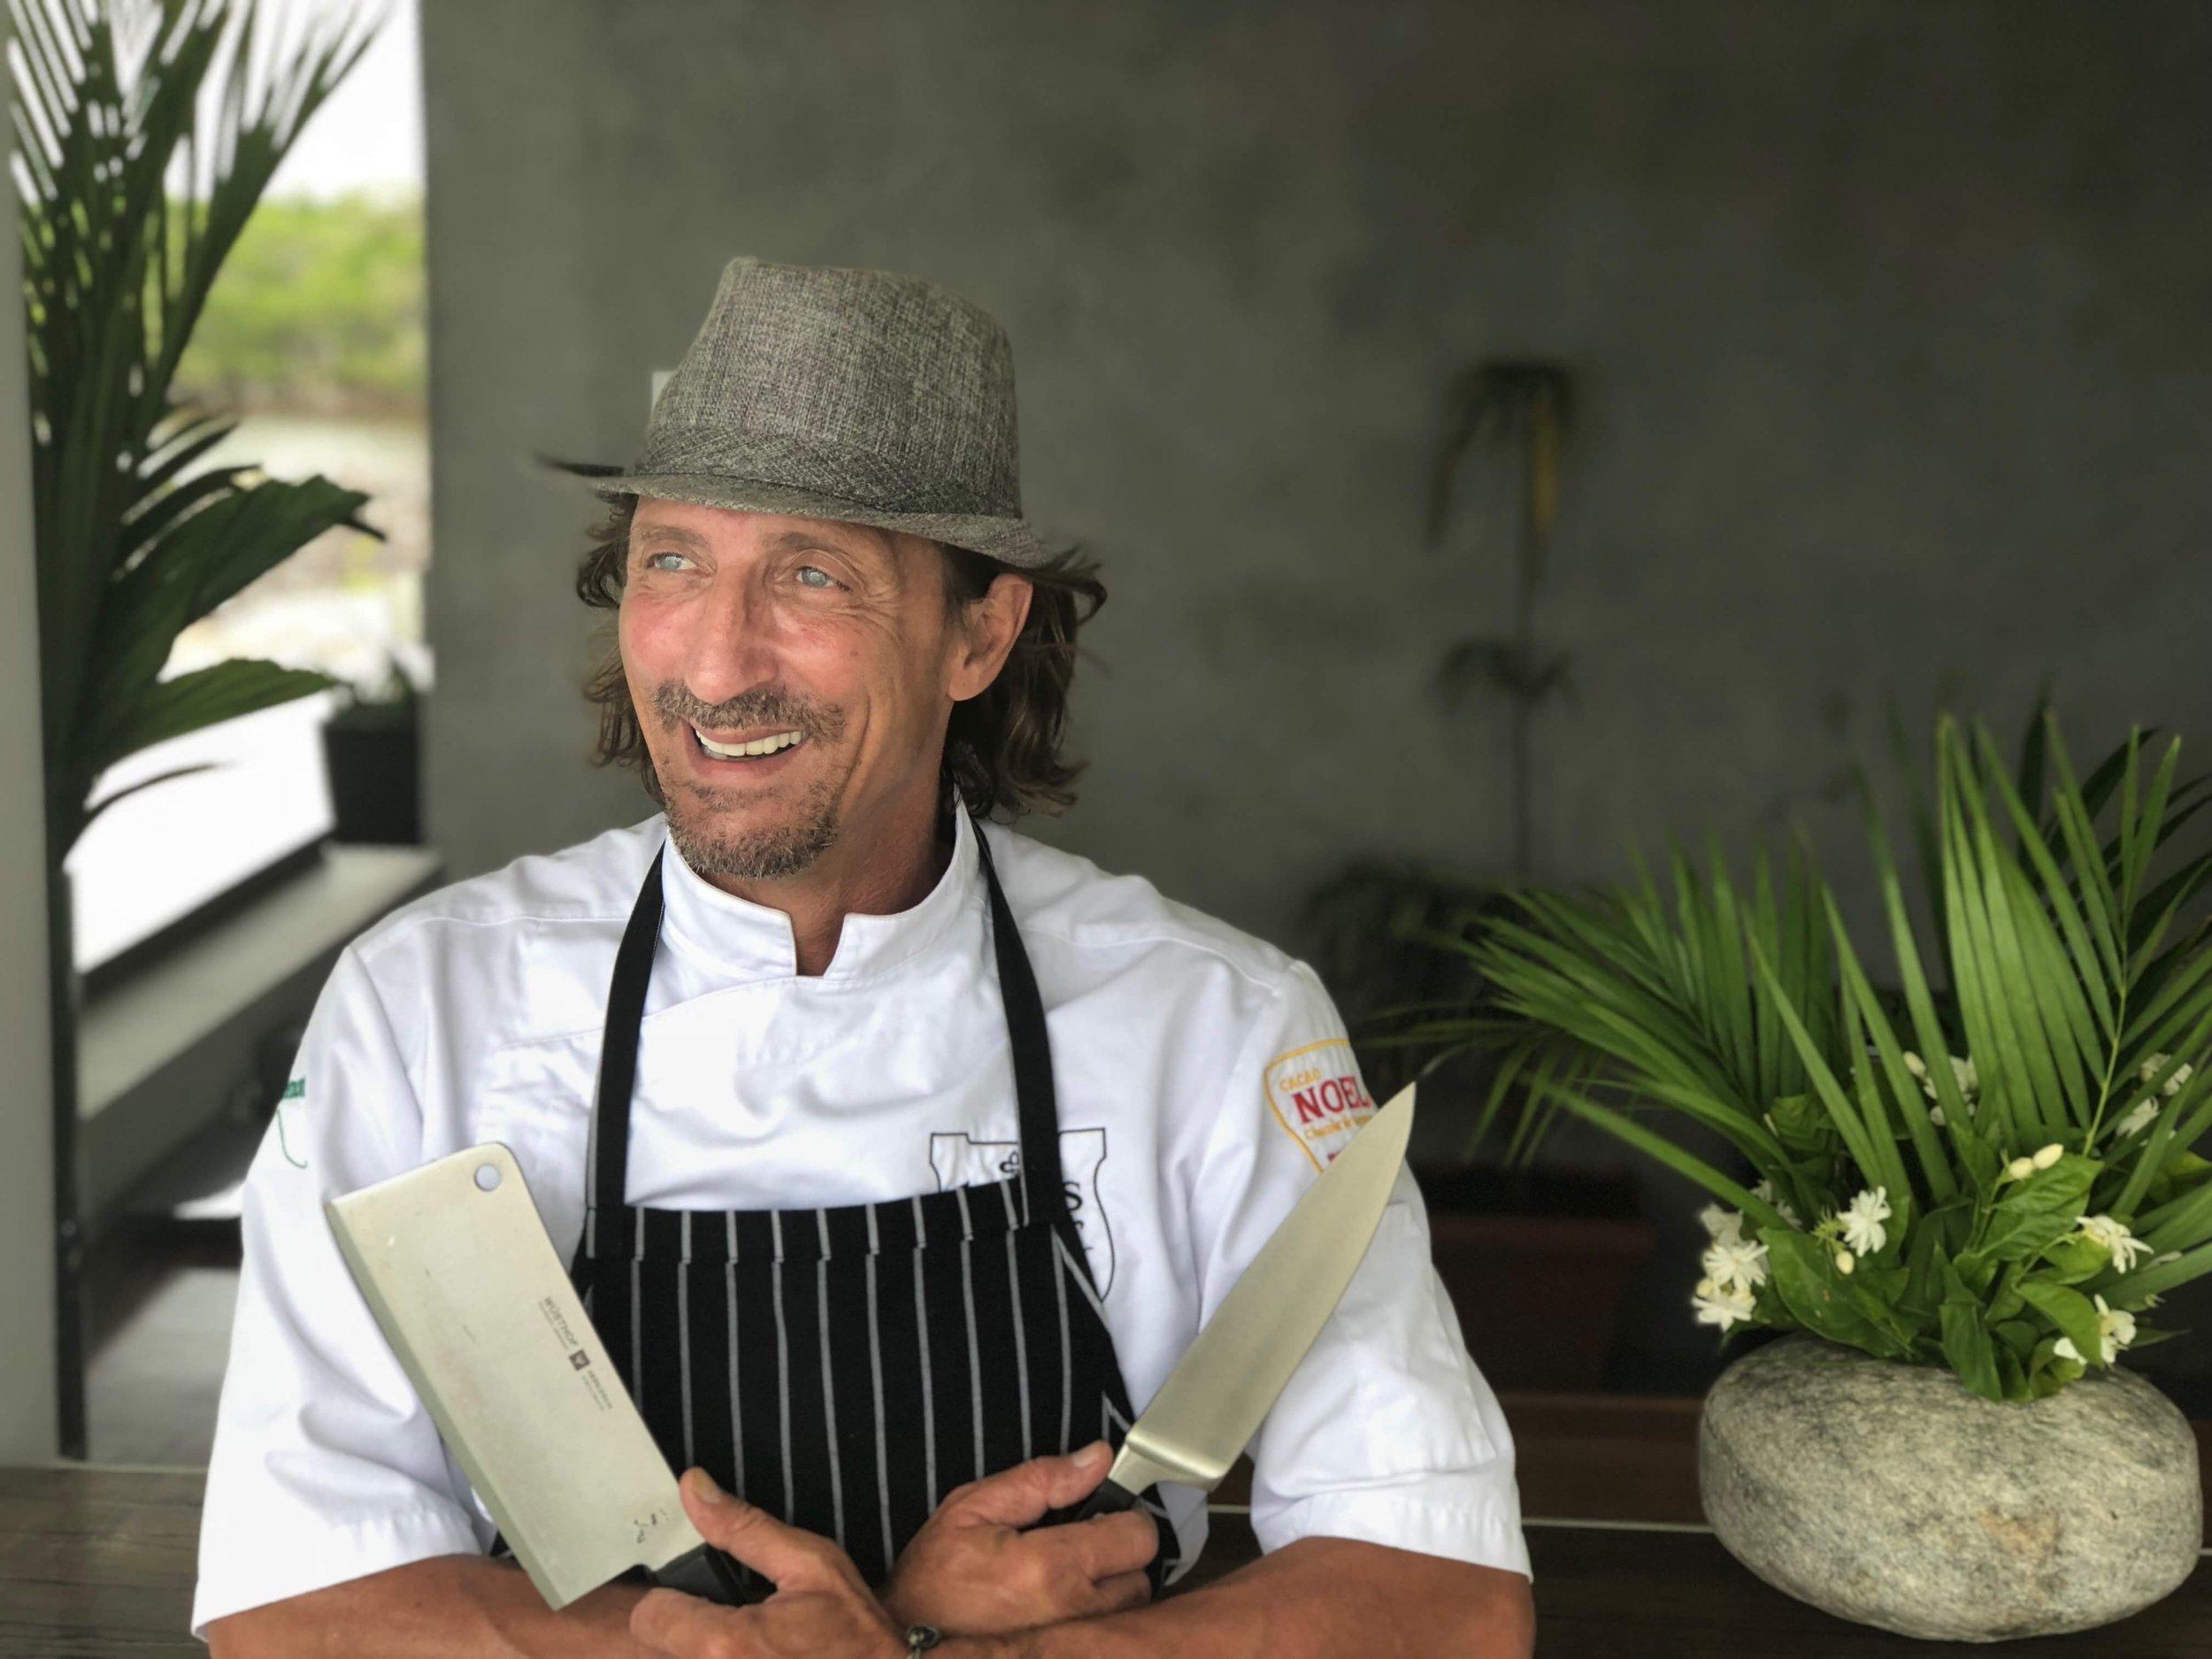 chef-patrick-parmentier-lefoofrog- photo.JPG